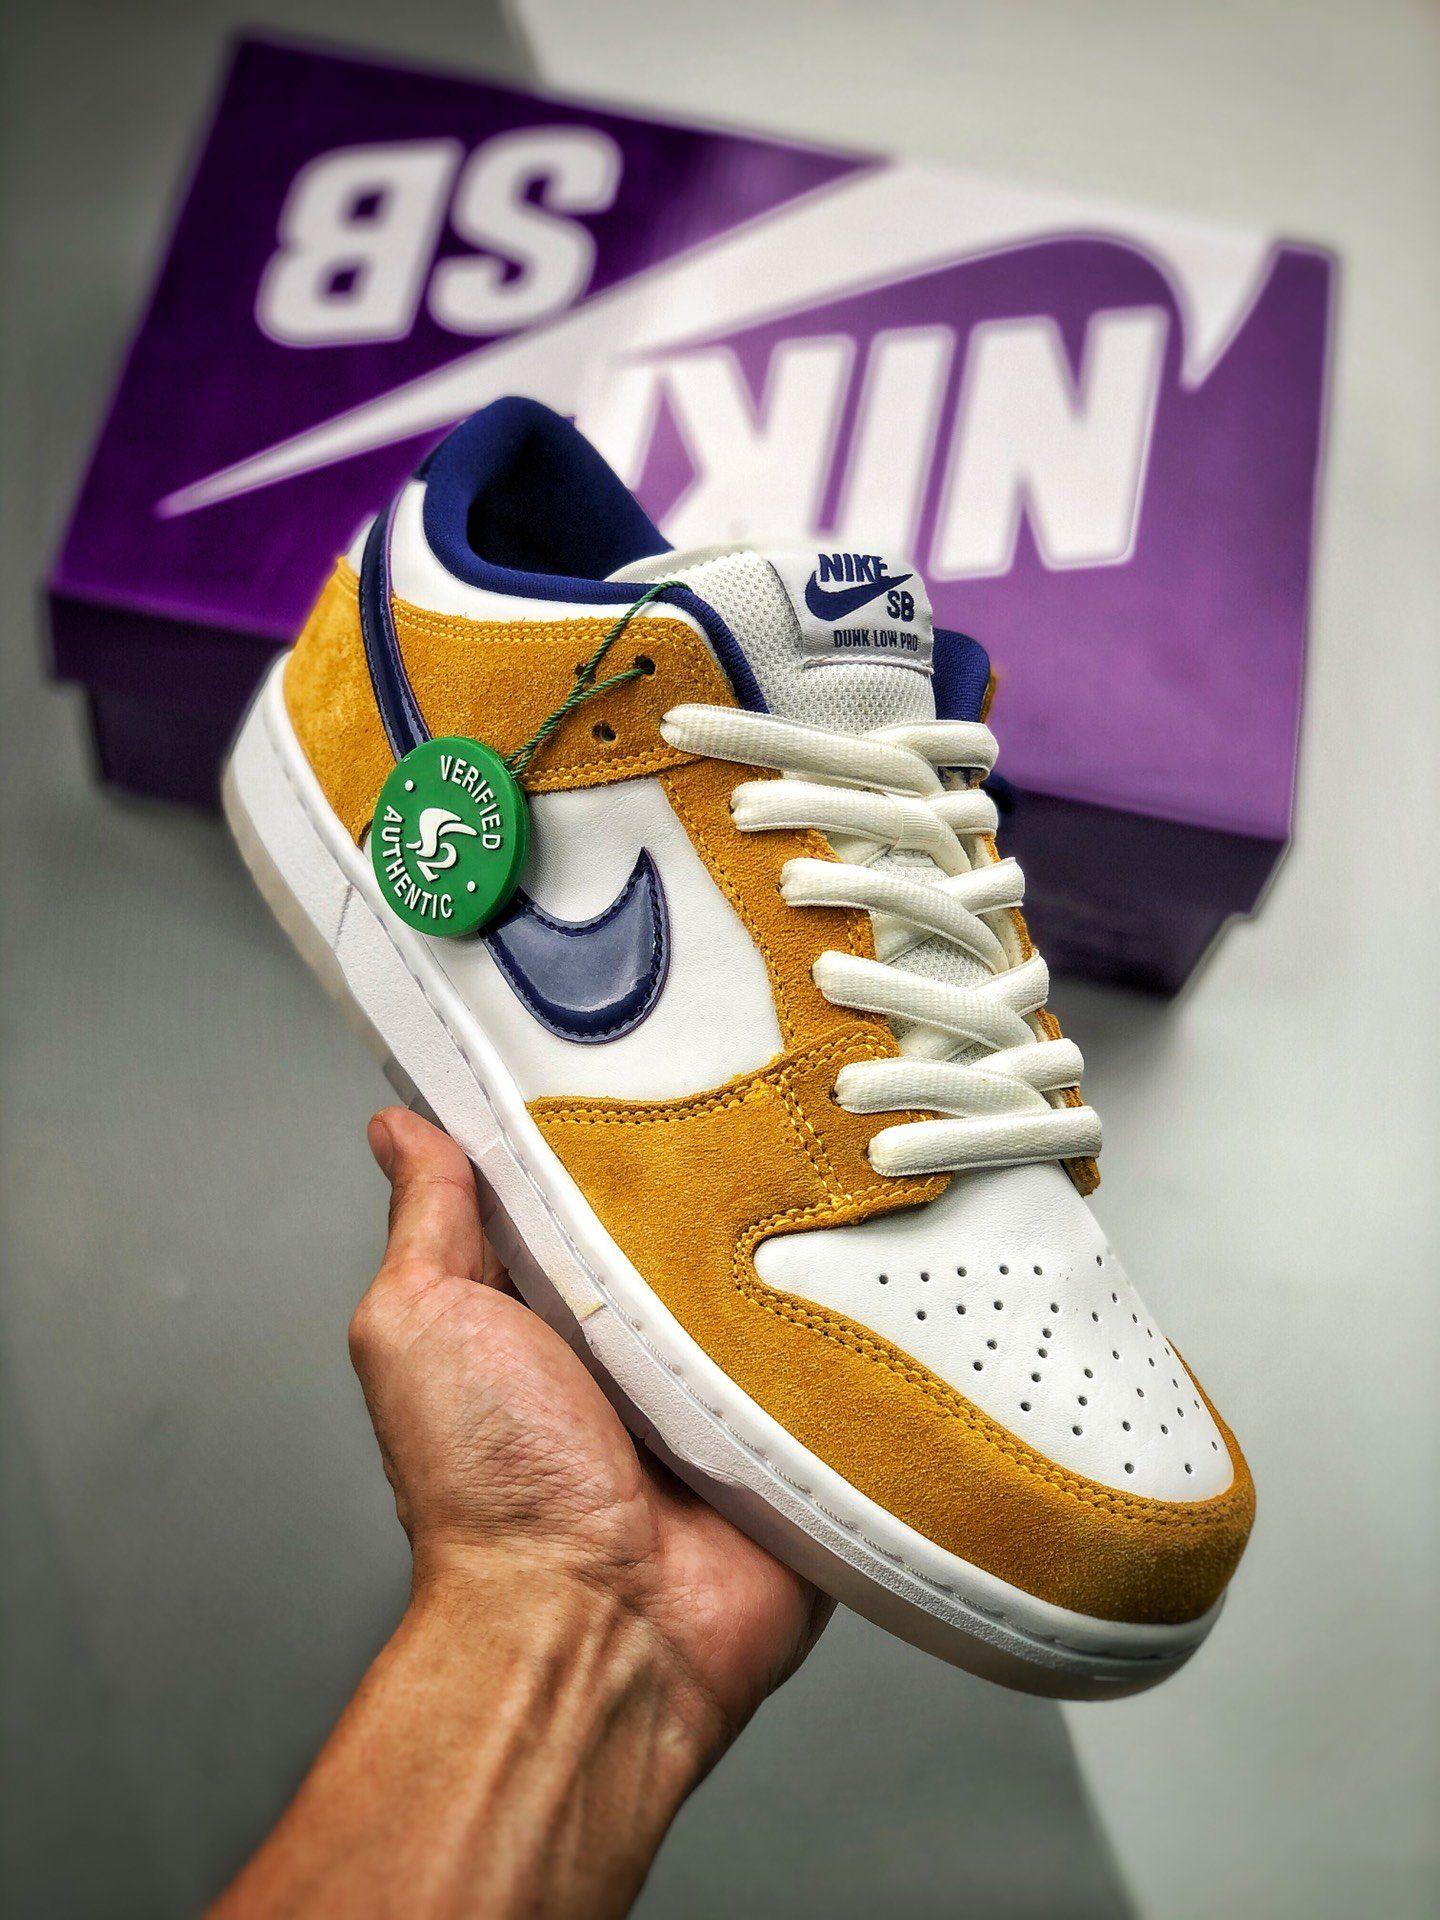 Nike Sb Dunk Low Pro Laser Orange Bq6817 800 Nike Sb Dunks Nike Sb Aesthetic Shoes